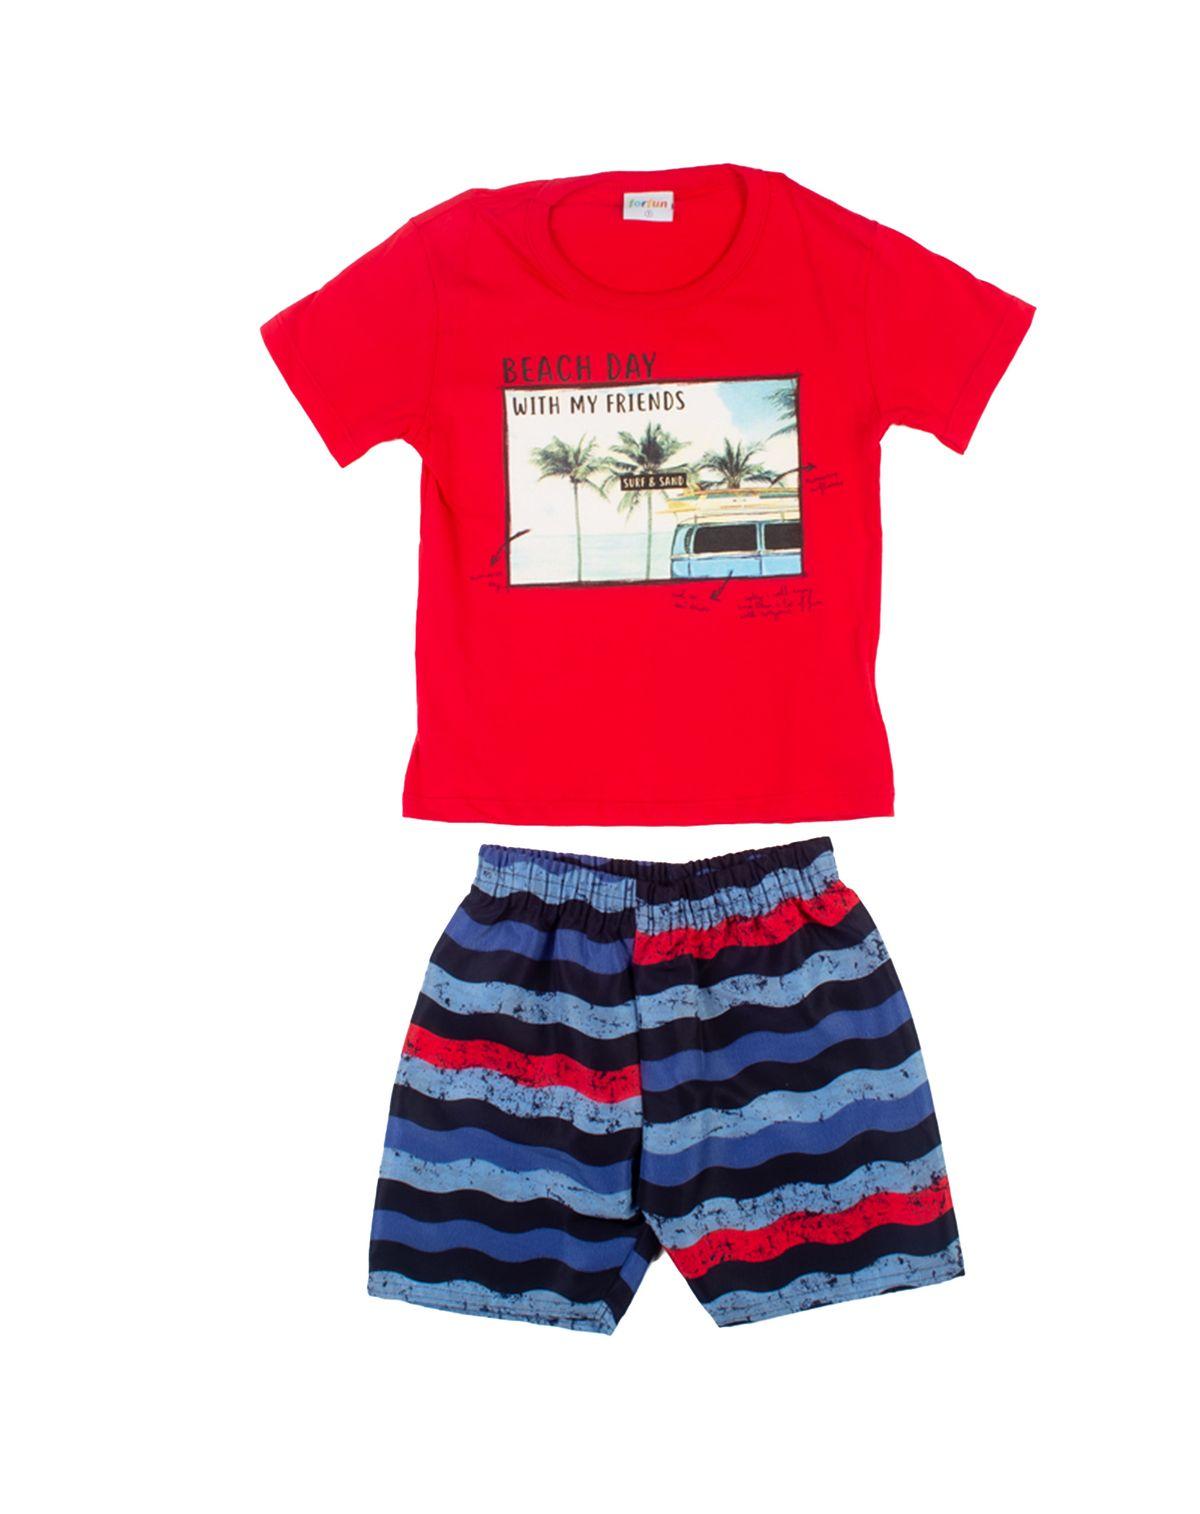 565929001-conjunto-curto-bebe-menino-estampa-praia-vermelho-marinho-1-369